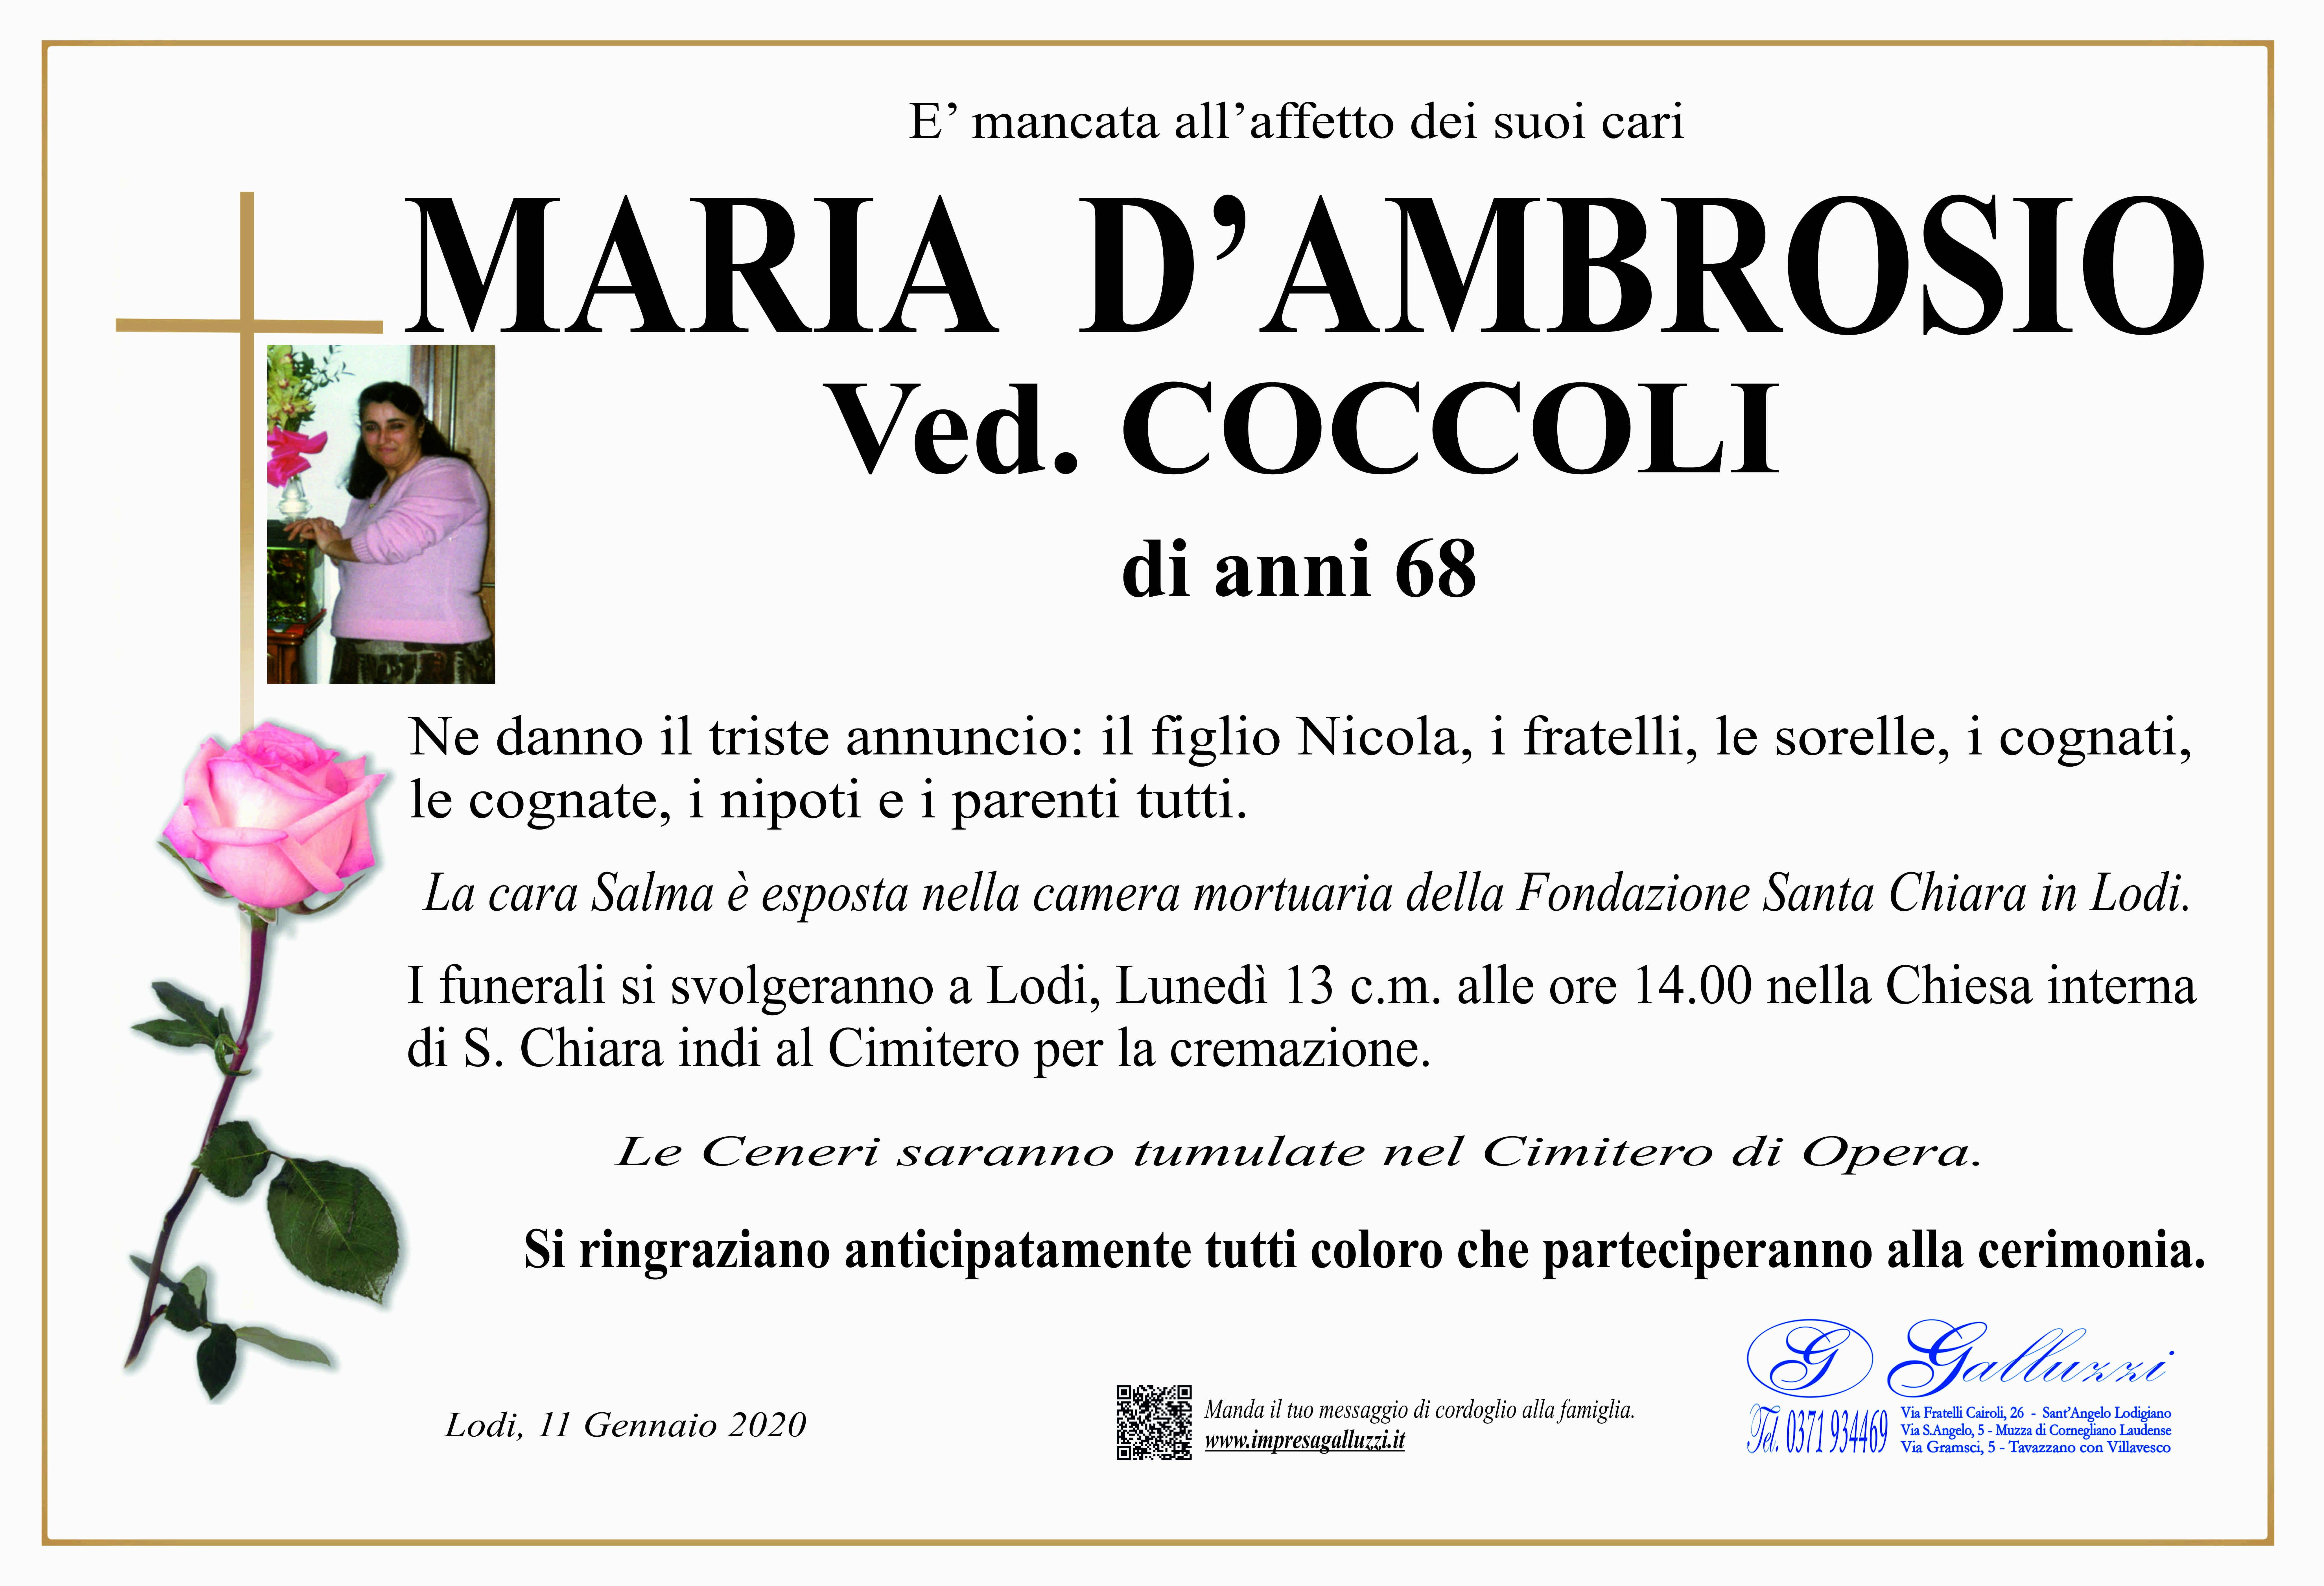 Maria D'Ambrosio